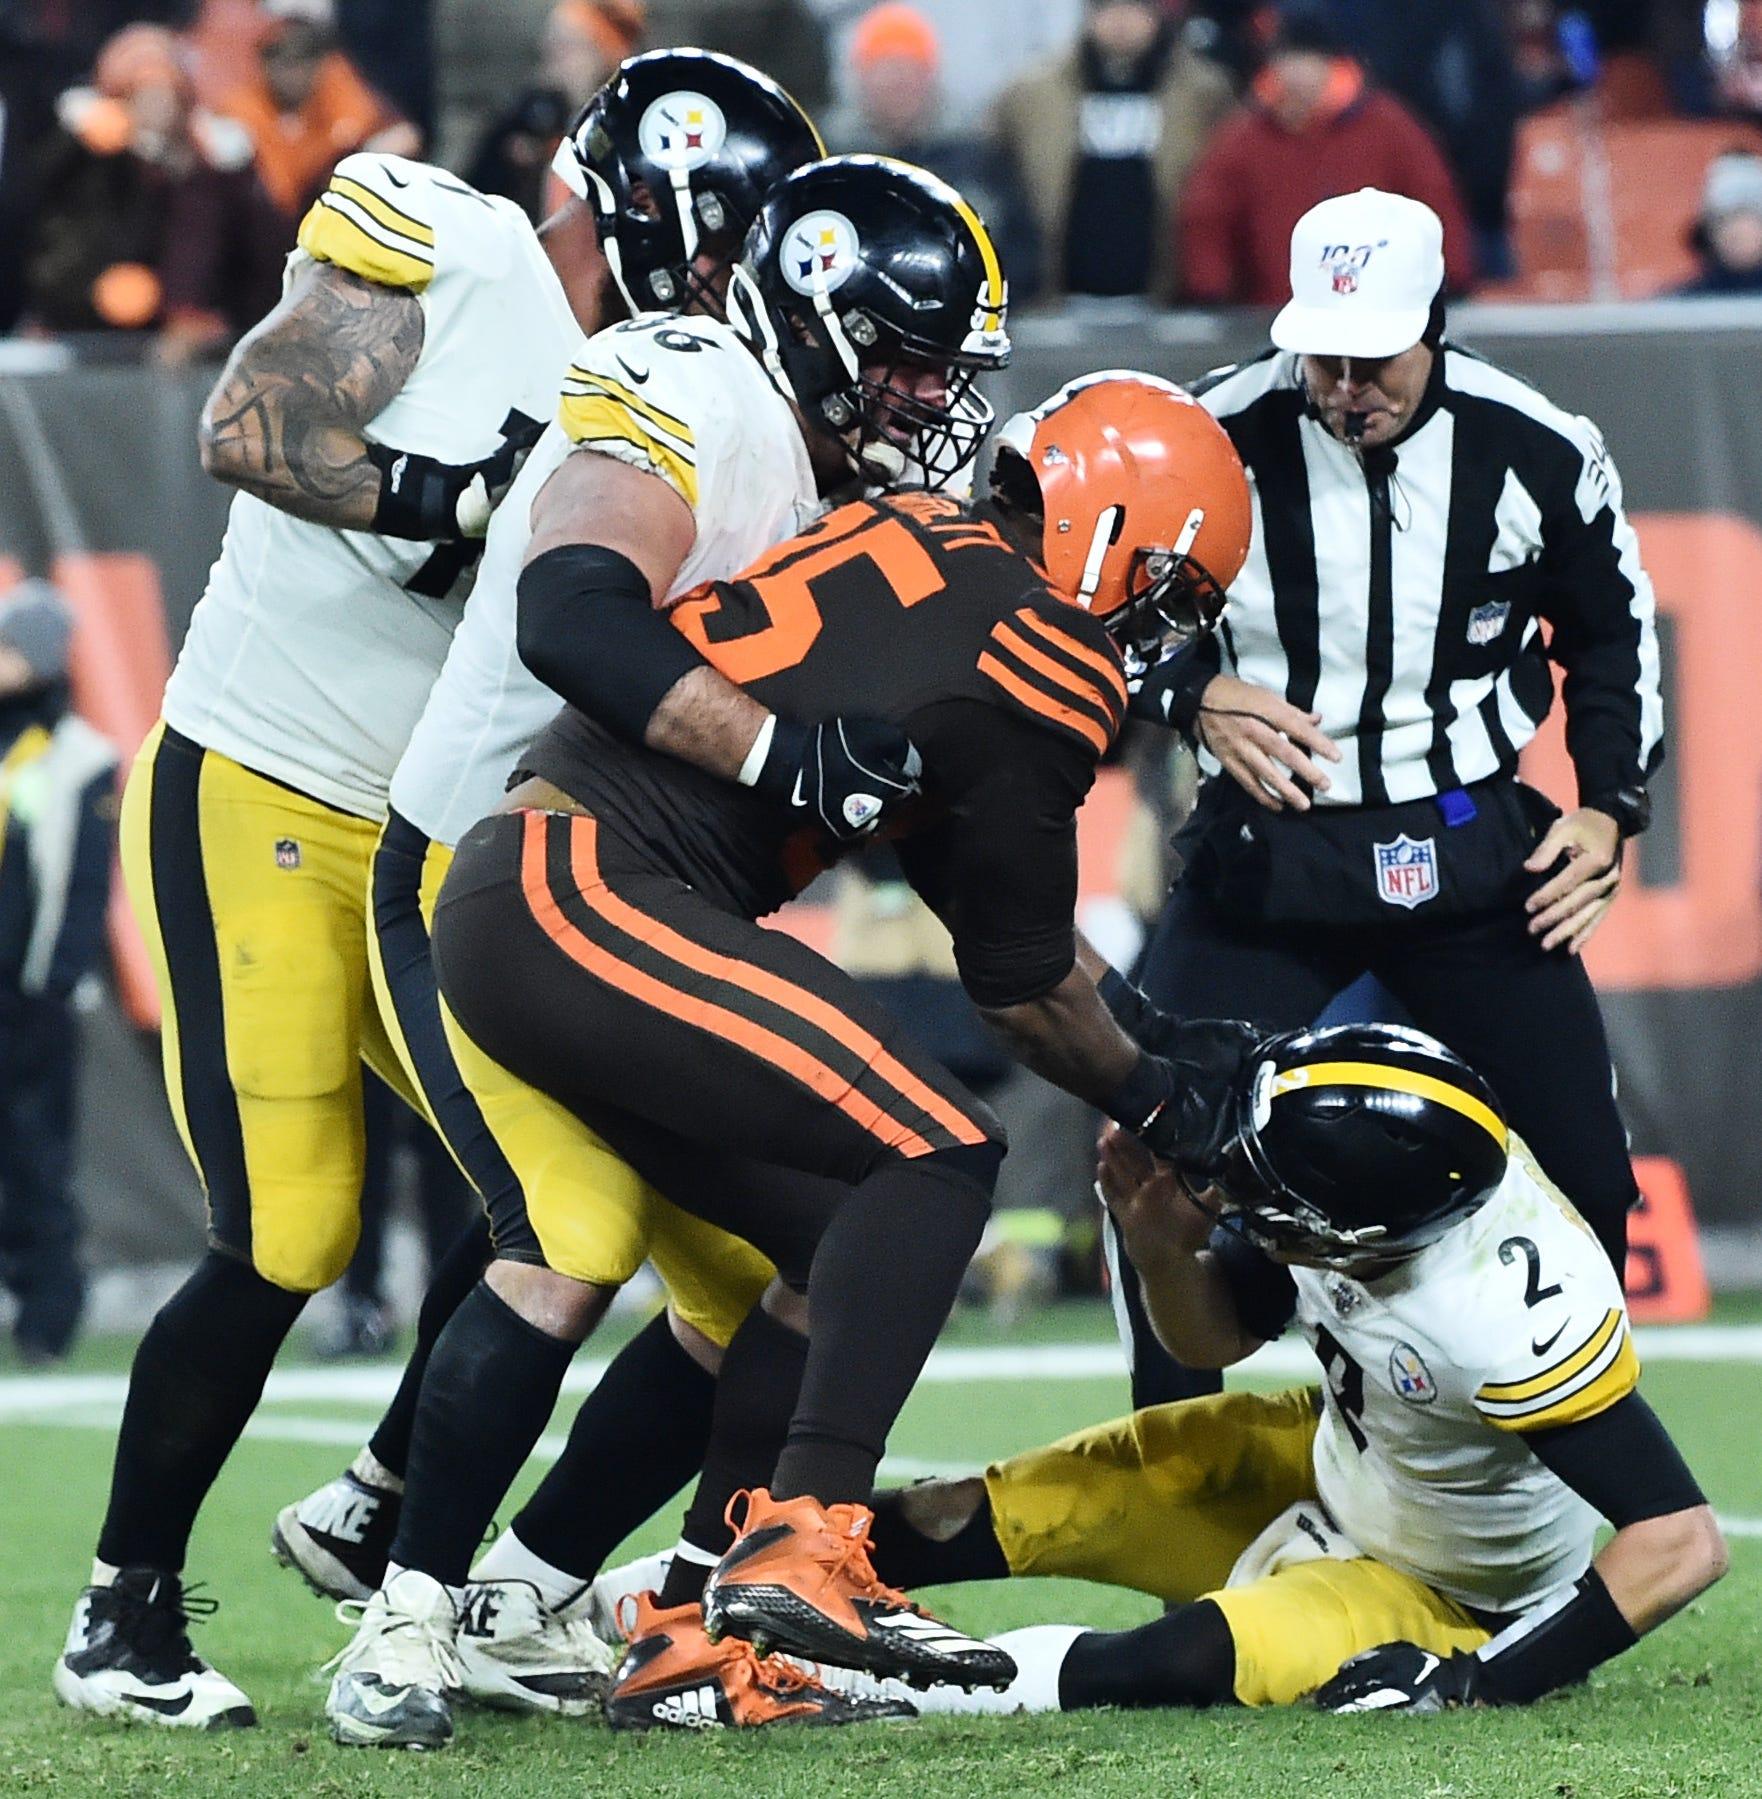 Browns' Myles Garrett swings helmet at Steelers QB Mason Rudolph, sparking ugly brawl